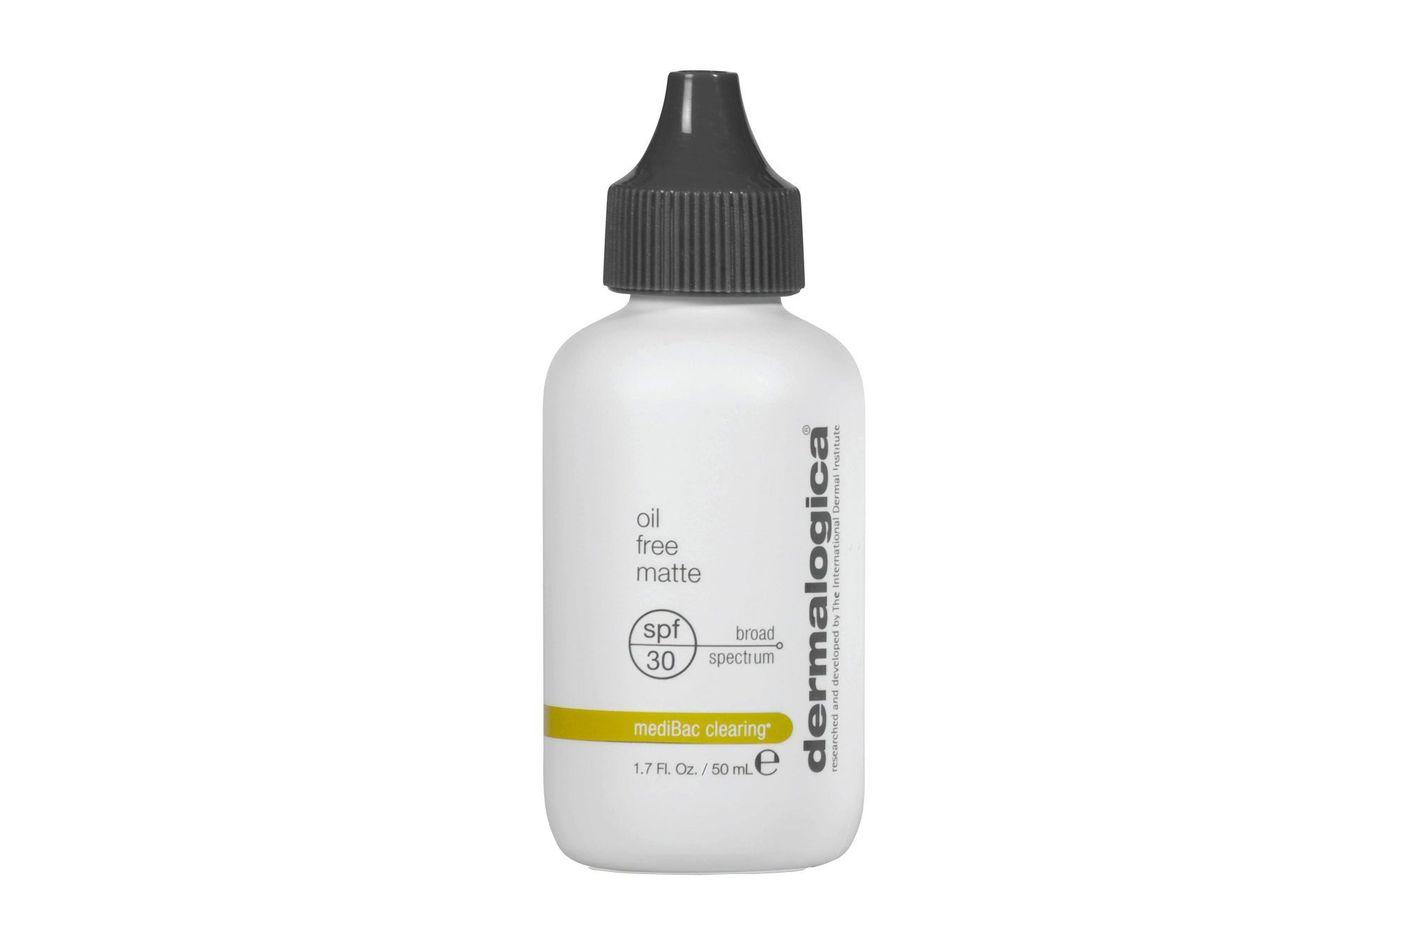 Dermalogica MediBac Clearing Oil Free Matte SPF 30